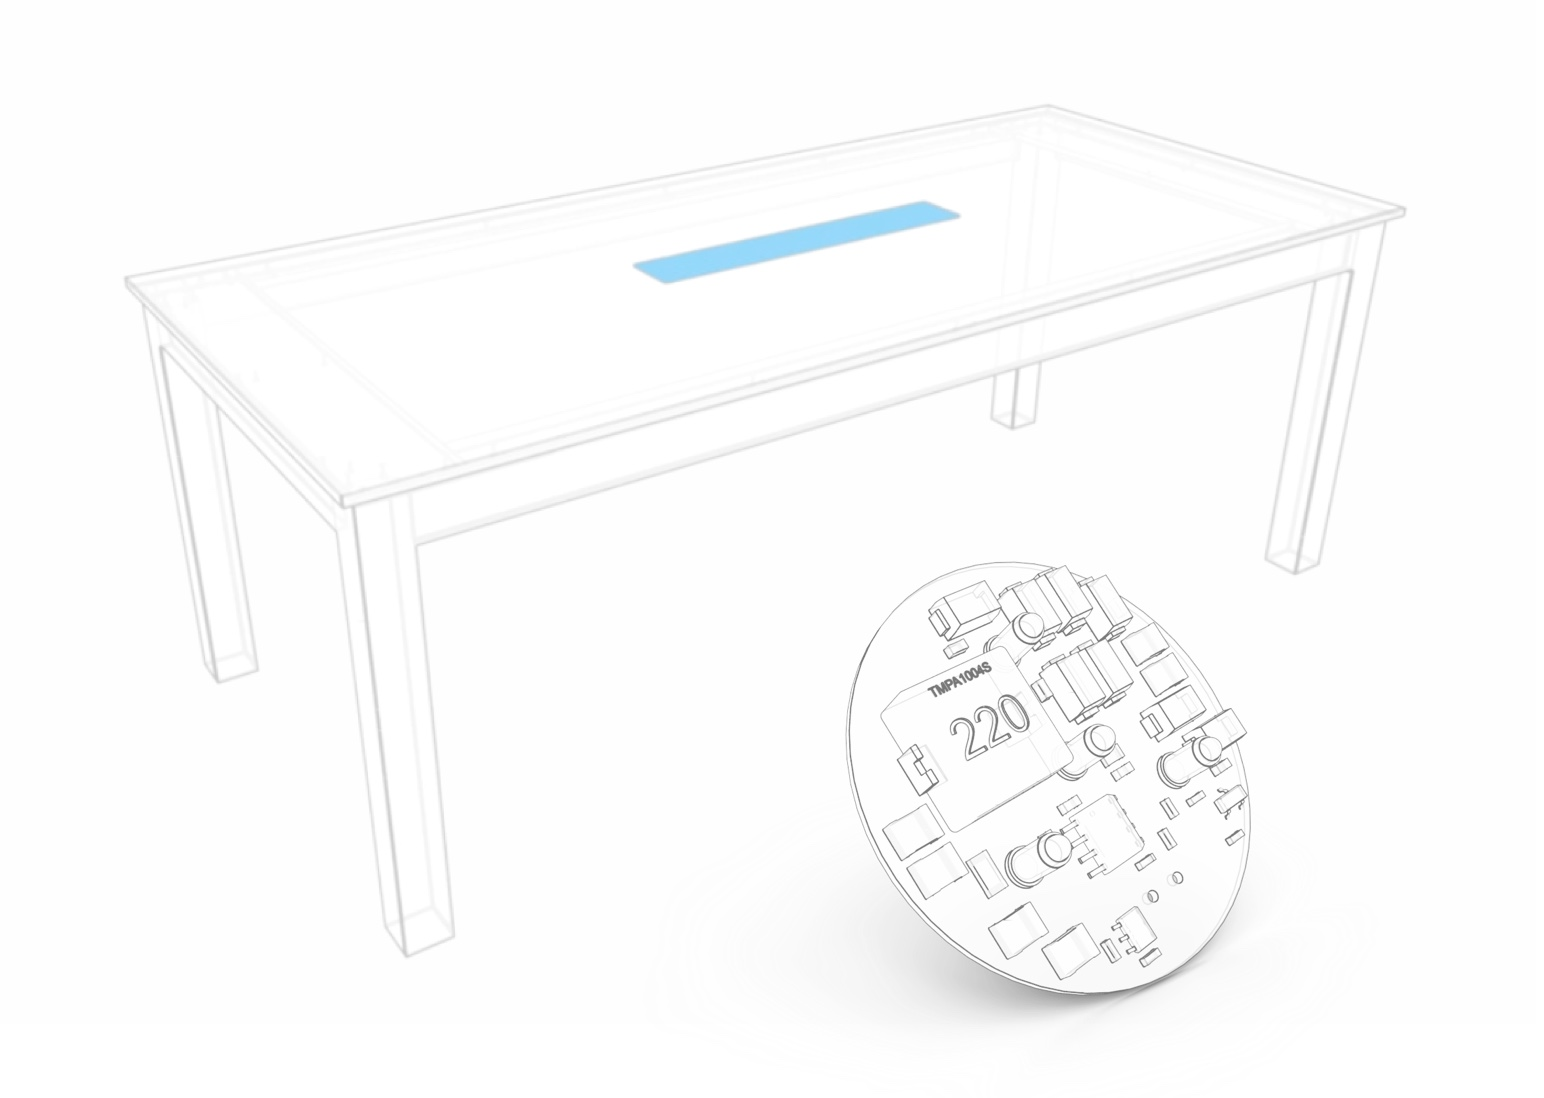 Technology Sketch